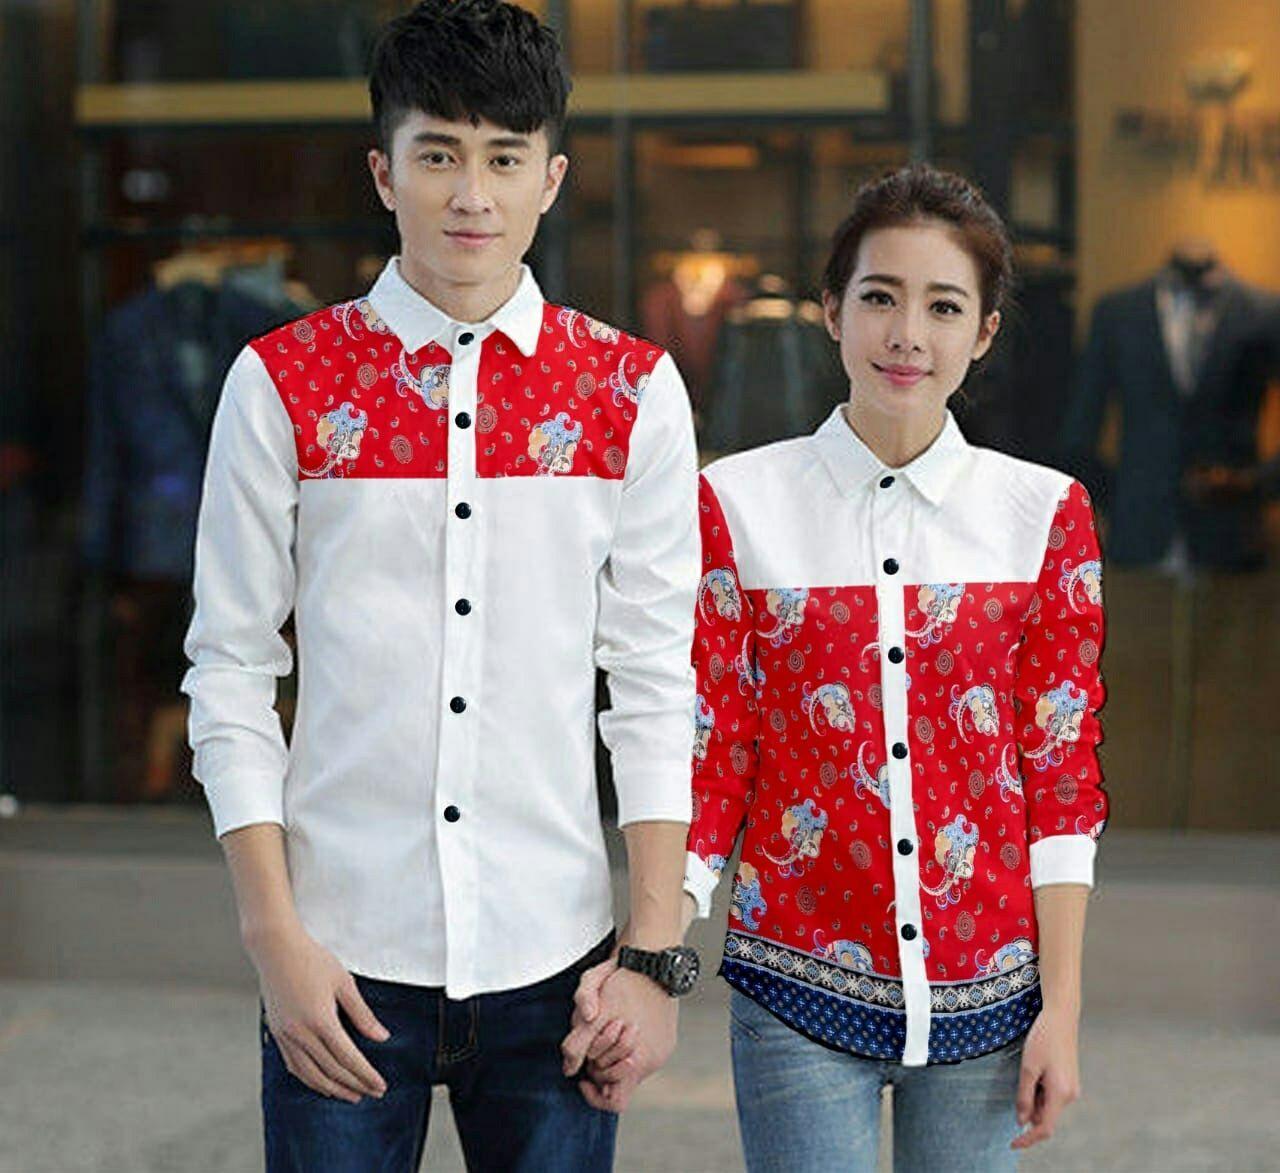 Hc - kemeja pasangan elepany- kemeja couple - baju couple - couple fashion - baju kembaran - kemeja